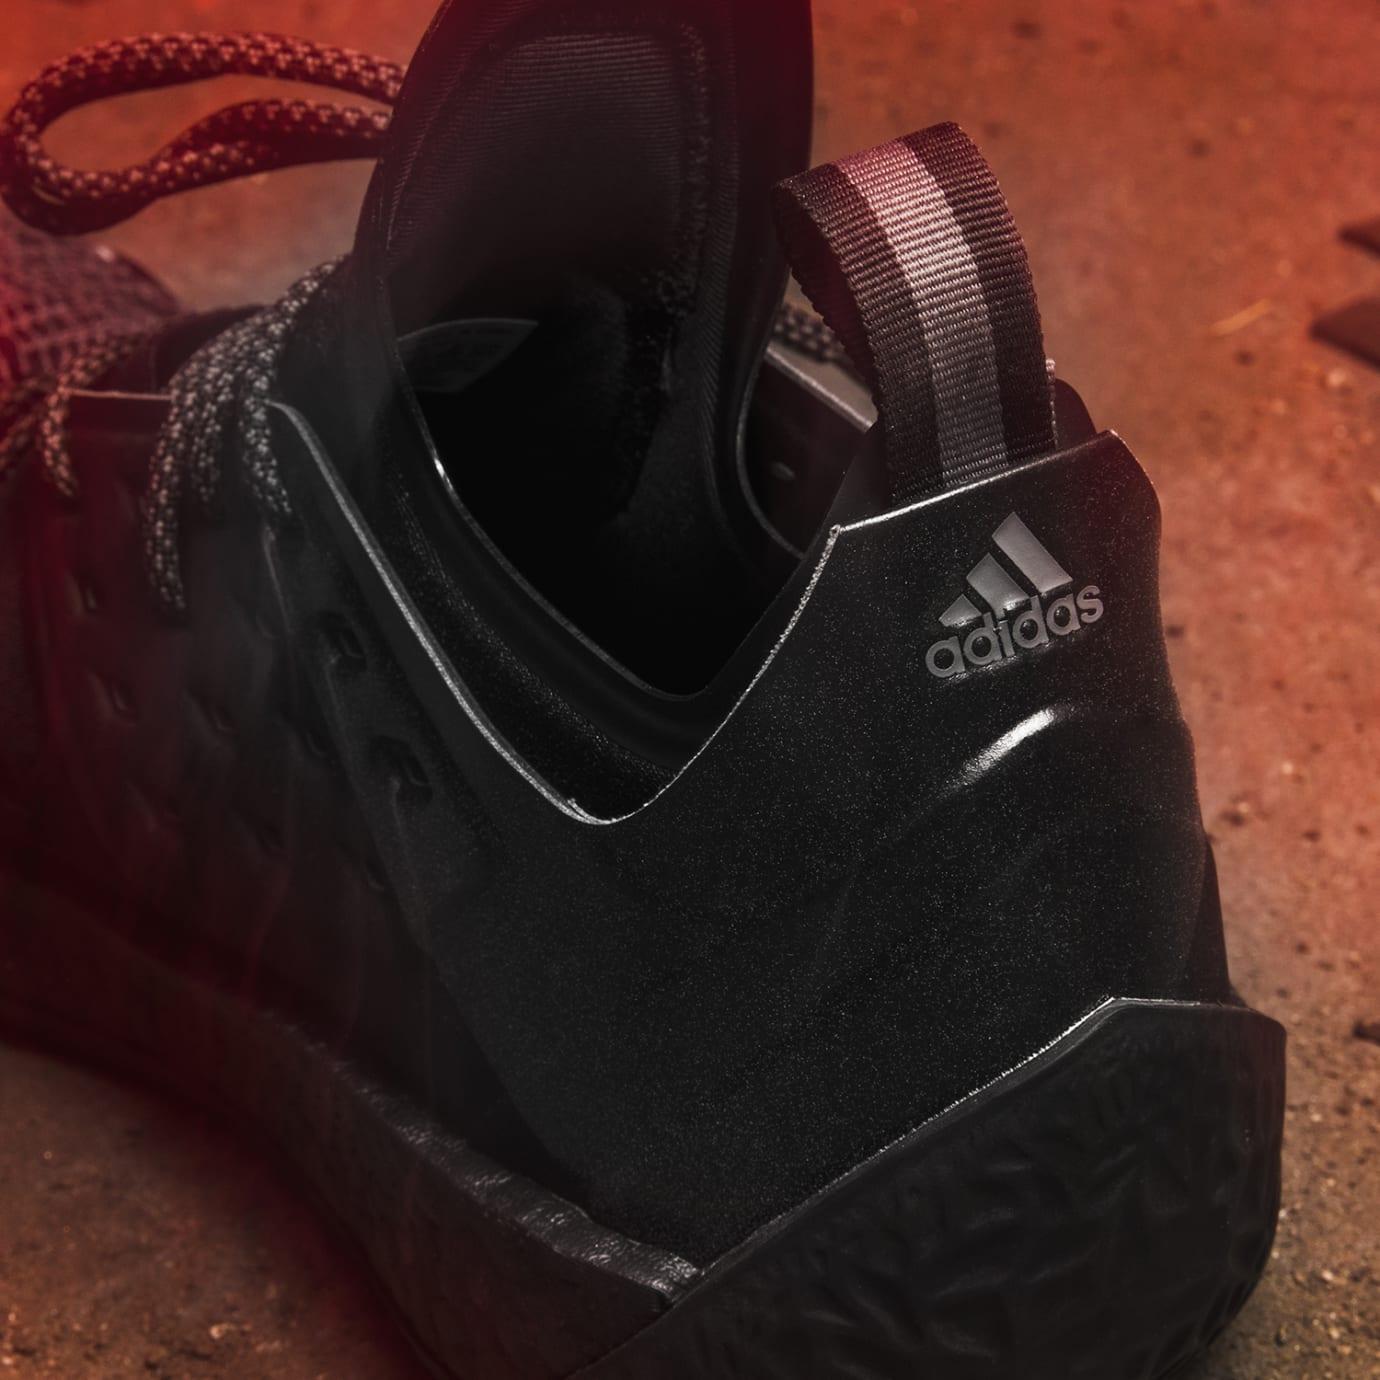 edfc7987b1a5 Adidas Harden Vol. 2 Nightmare Release Date F34361 Heel